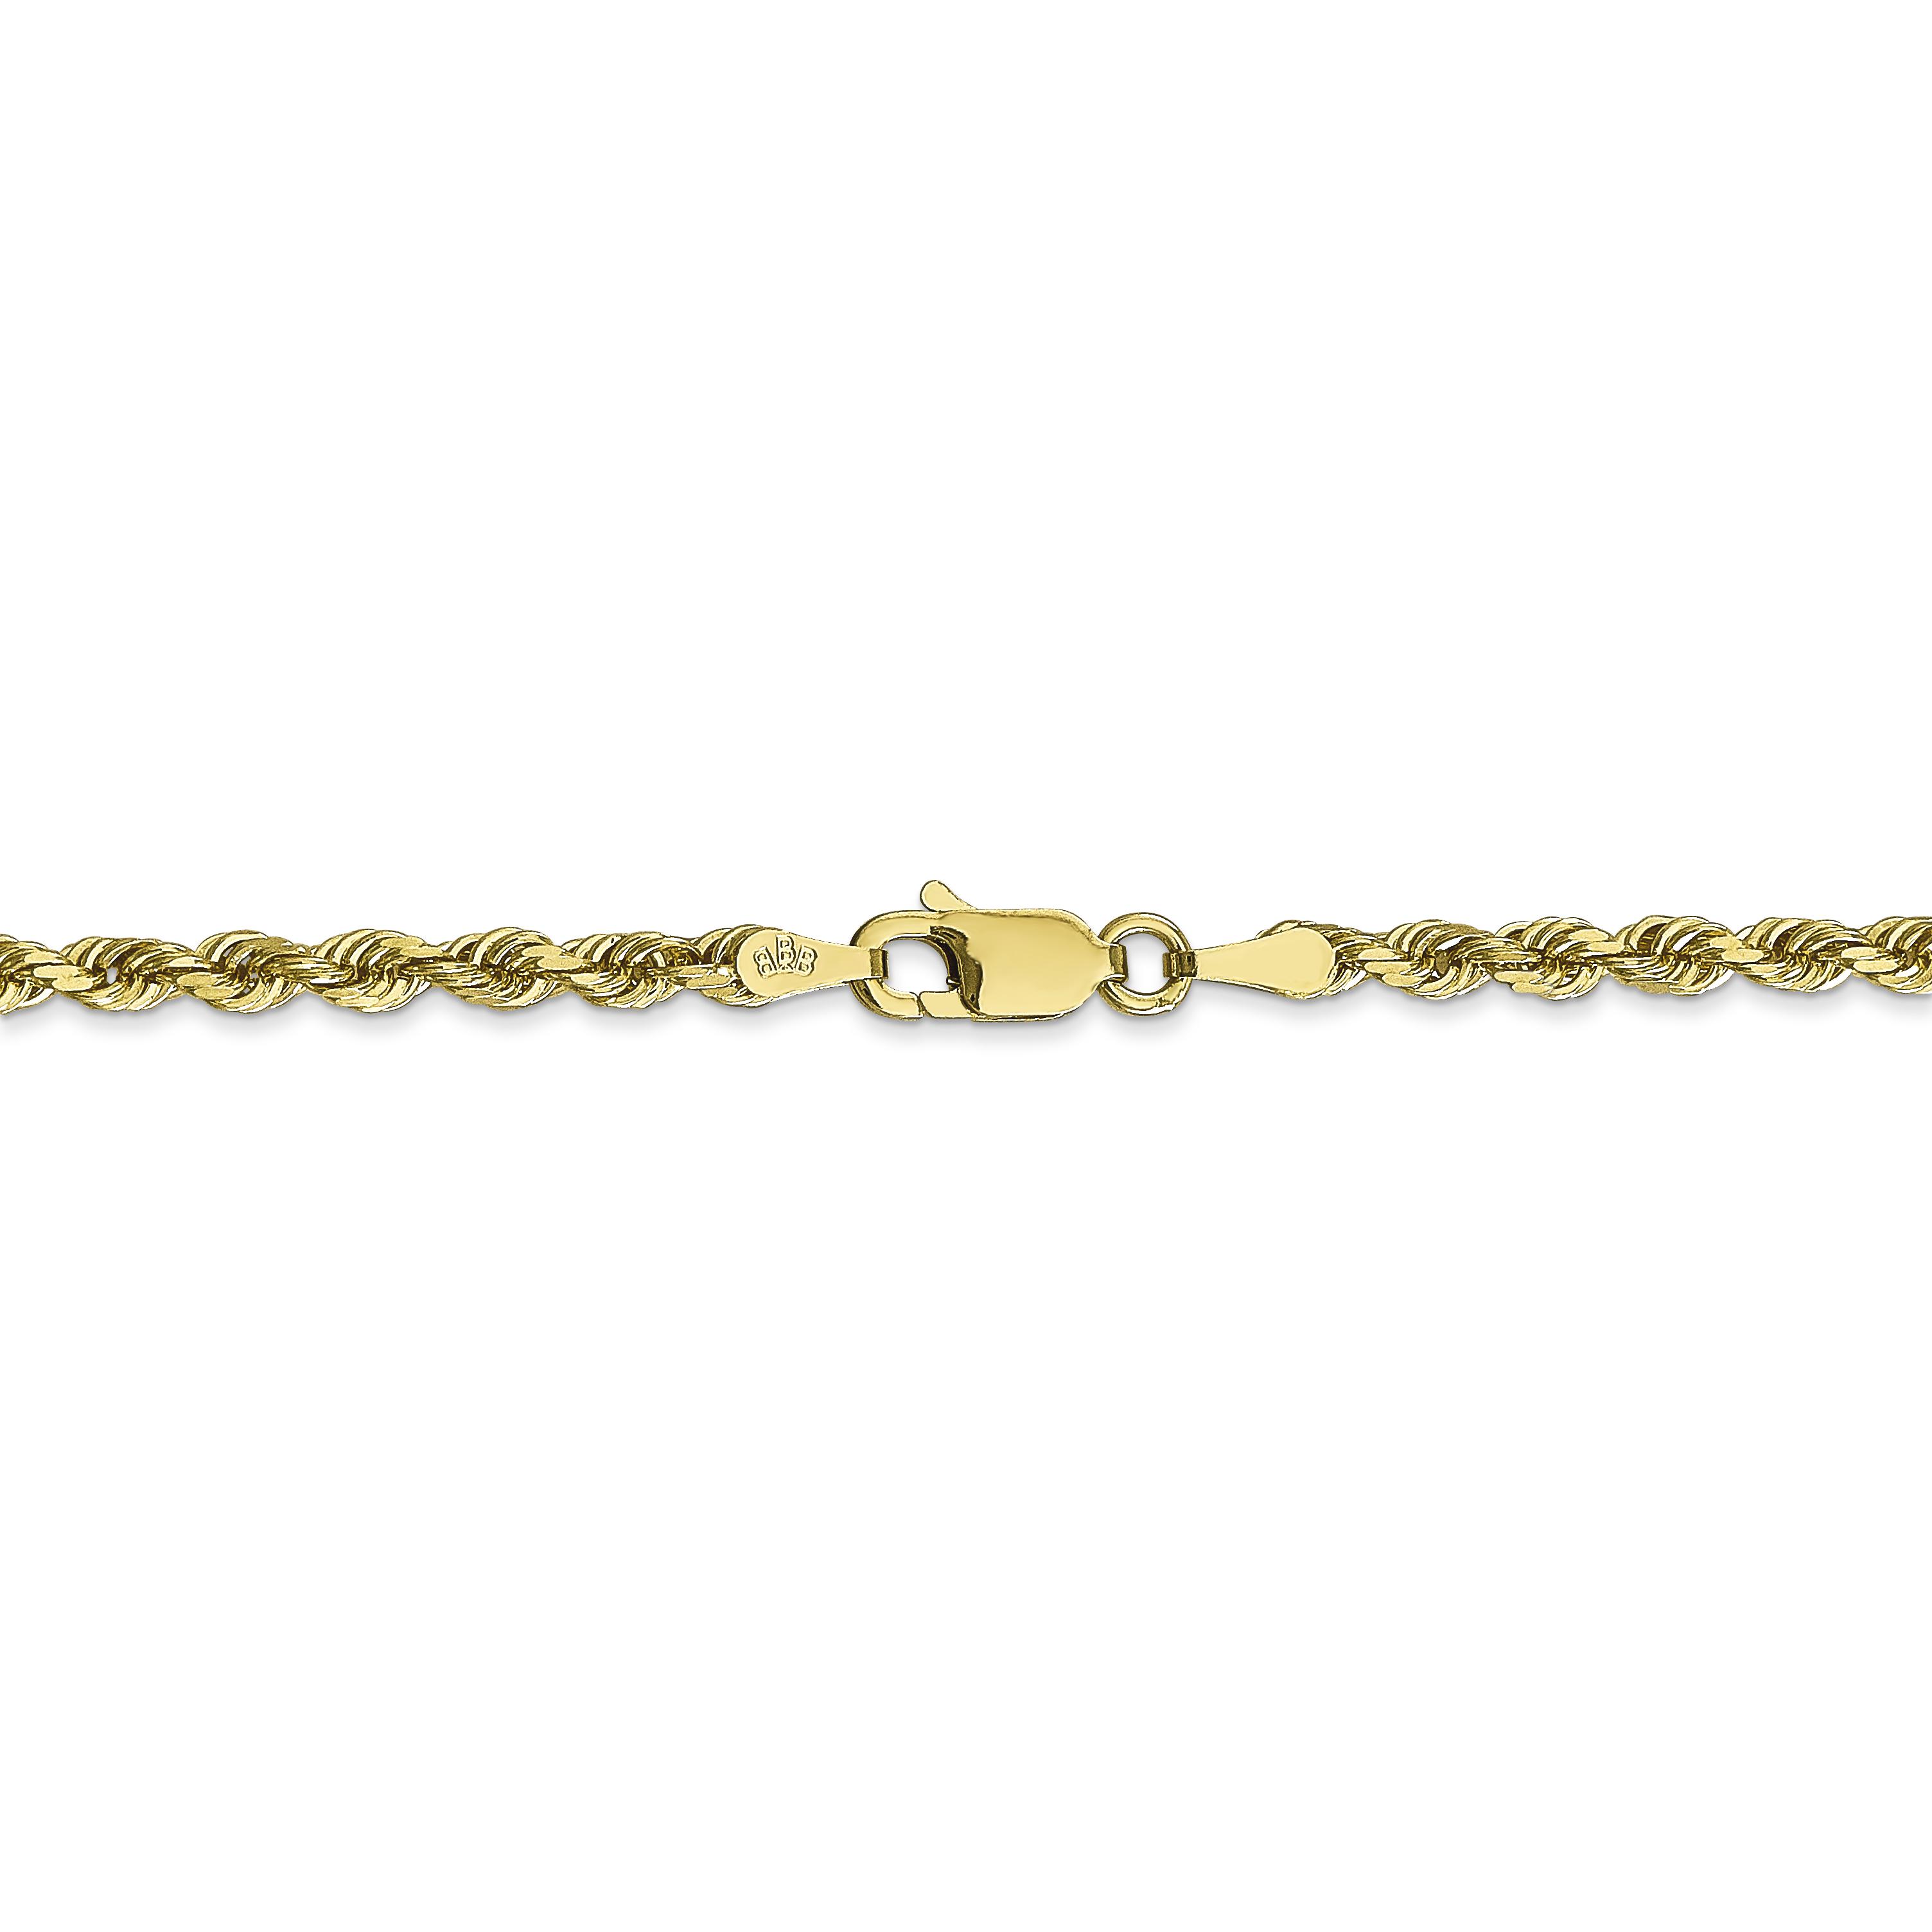 10K Yellow Gold 3.0mm Diamond Cut Quadruple Rope Chain 18 Inch - image 3 of 5